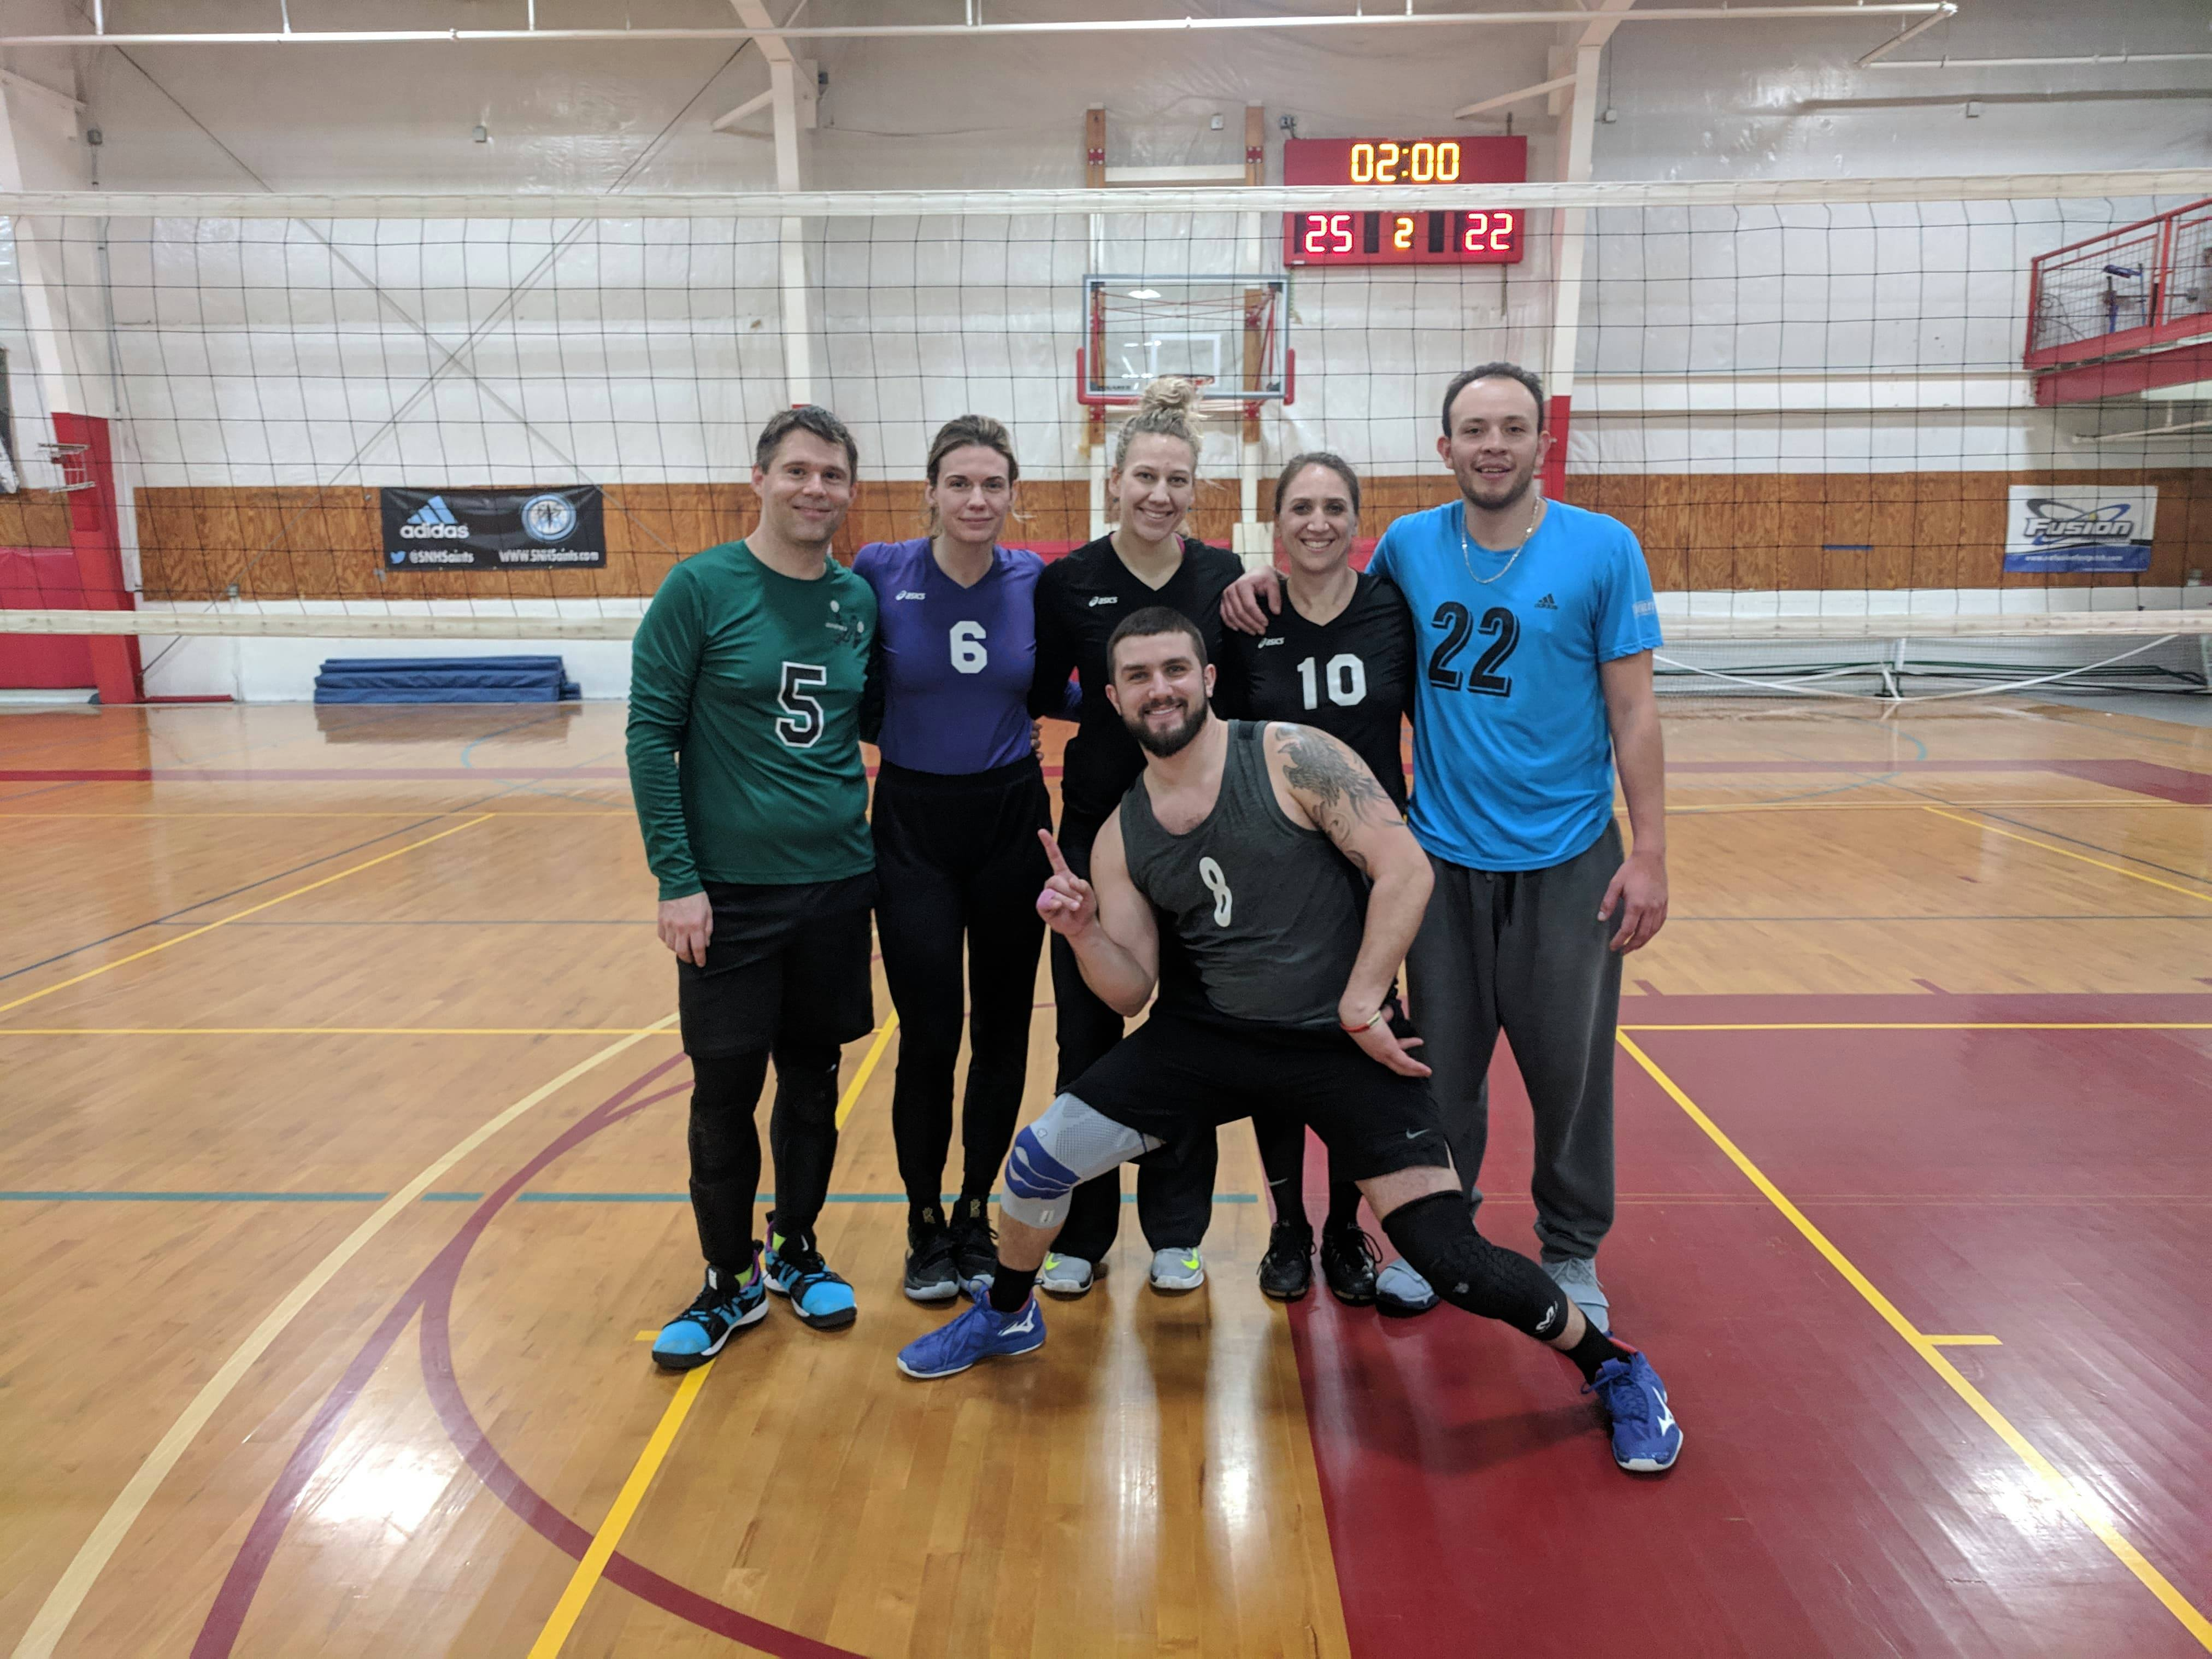 3/17/2019 RCO B- Champions - Half Man Half Maine